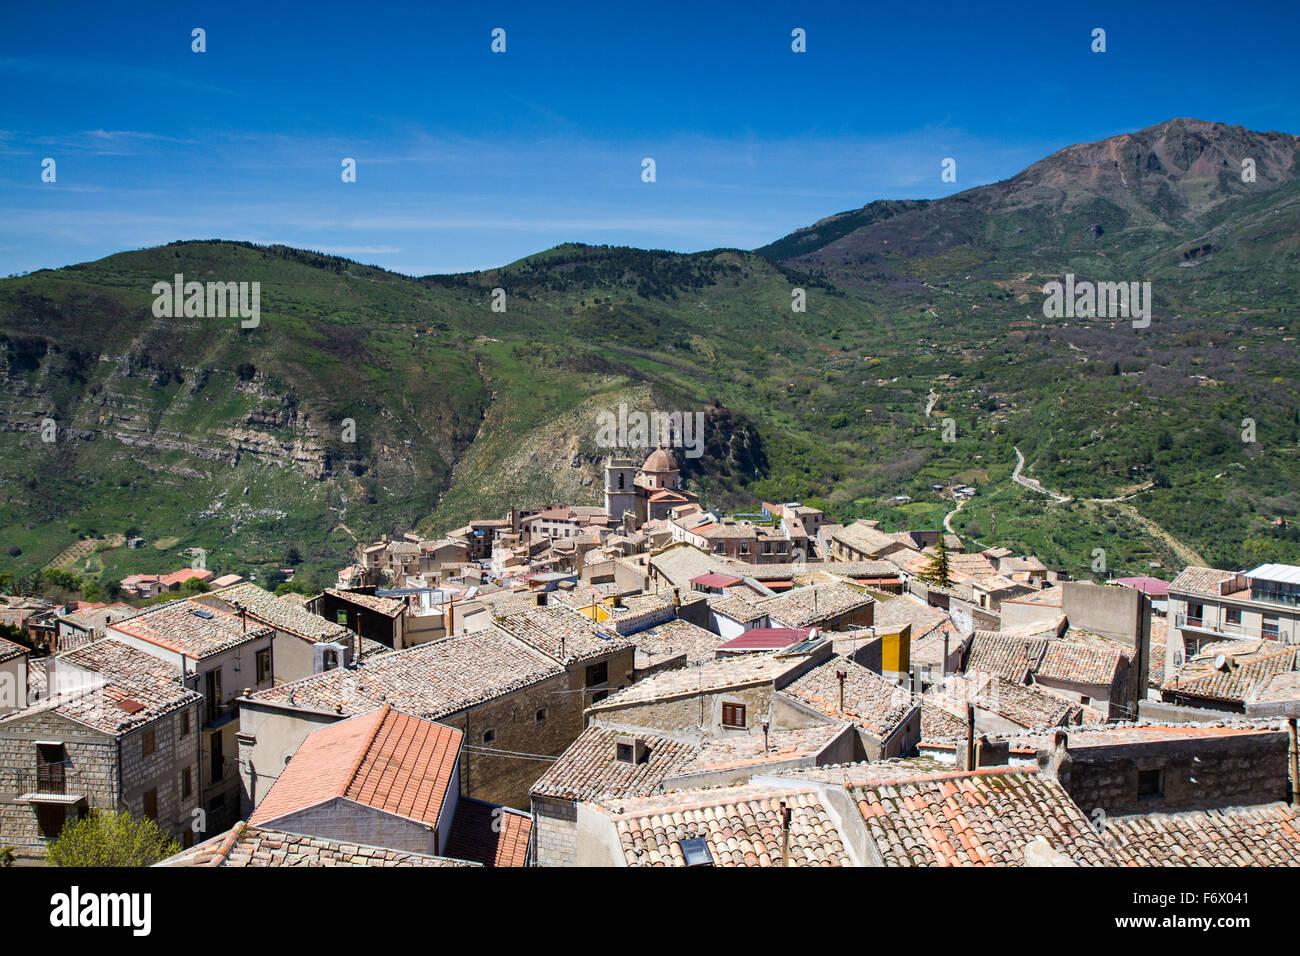 Panorama di Petralia Sottana, Sicilia, Italia Immagini Stock